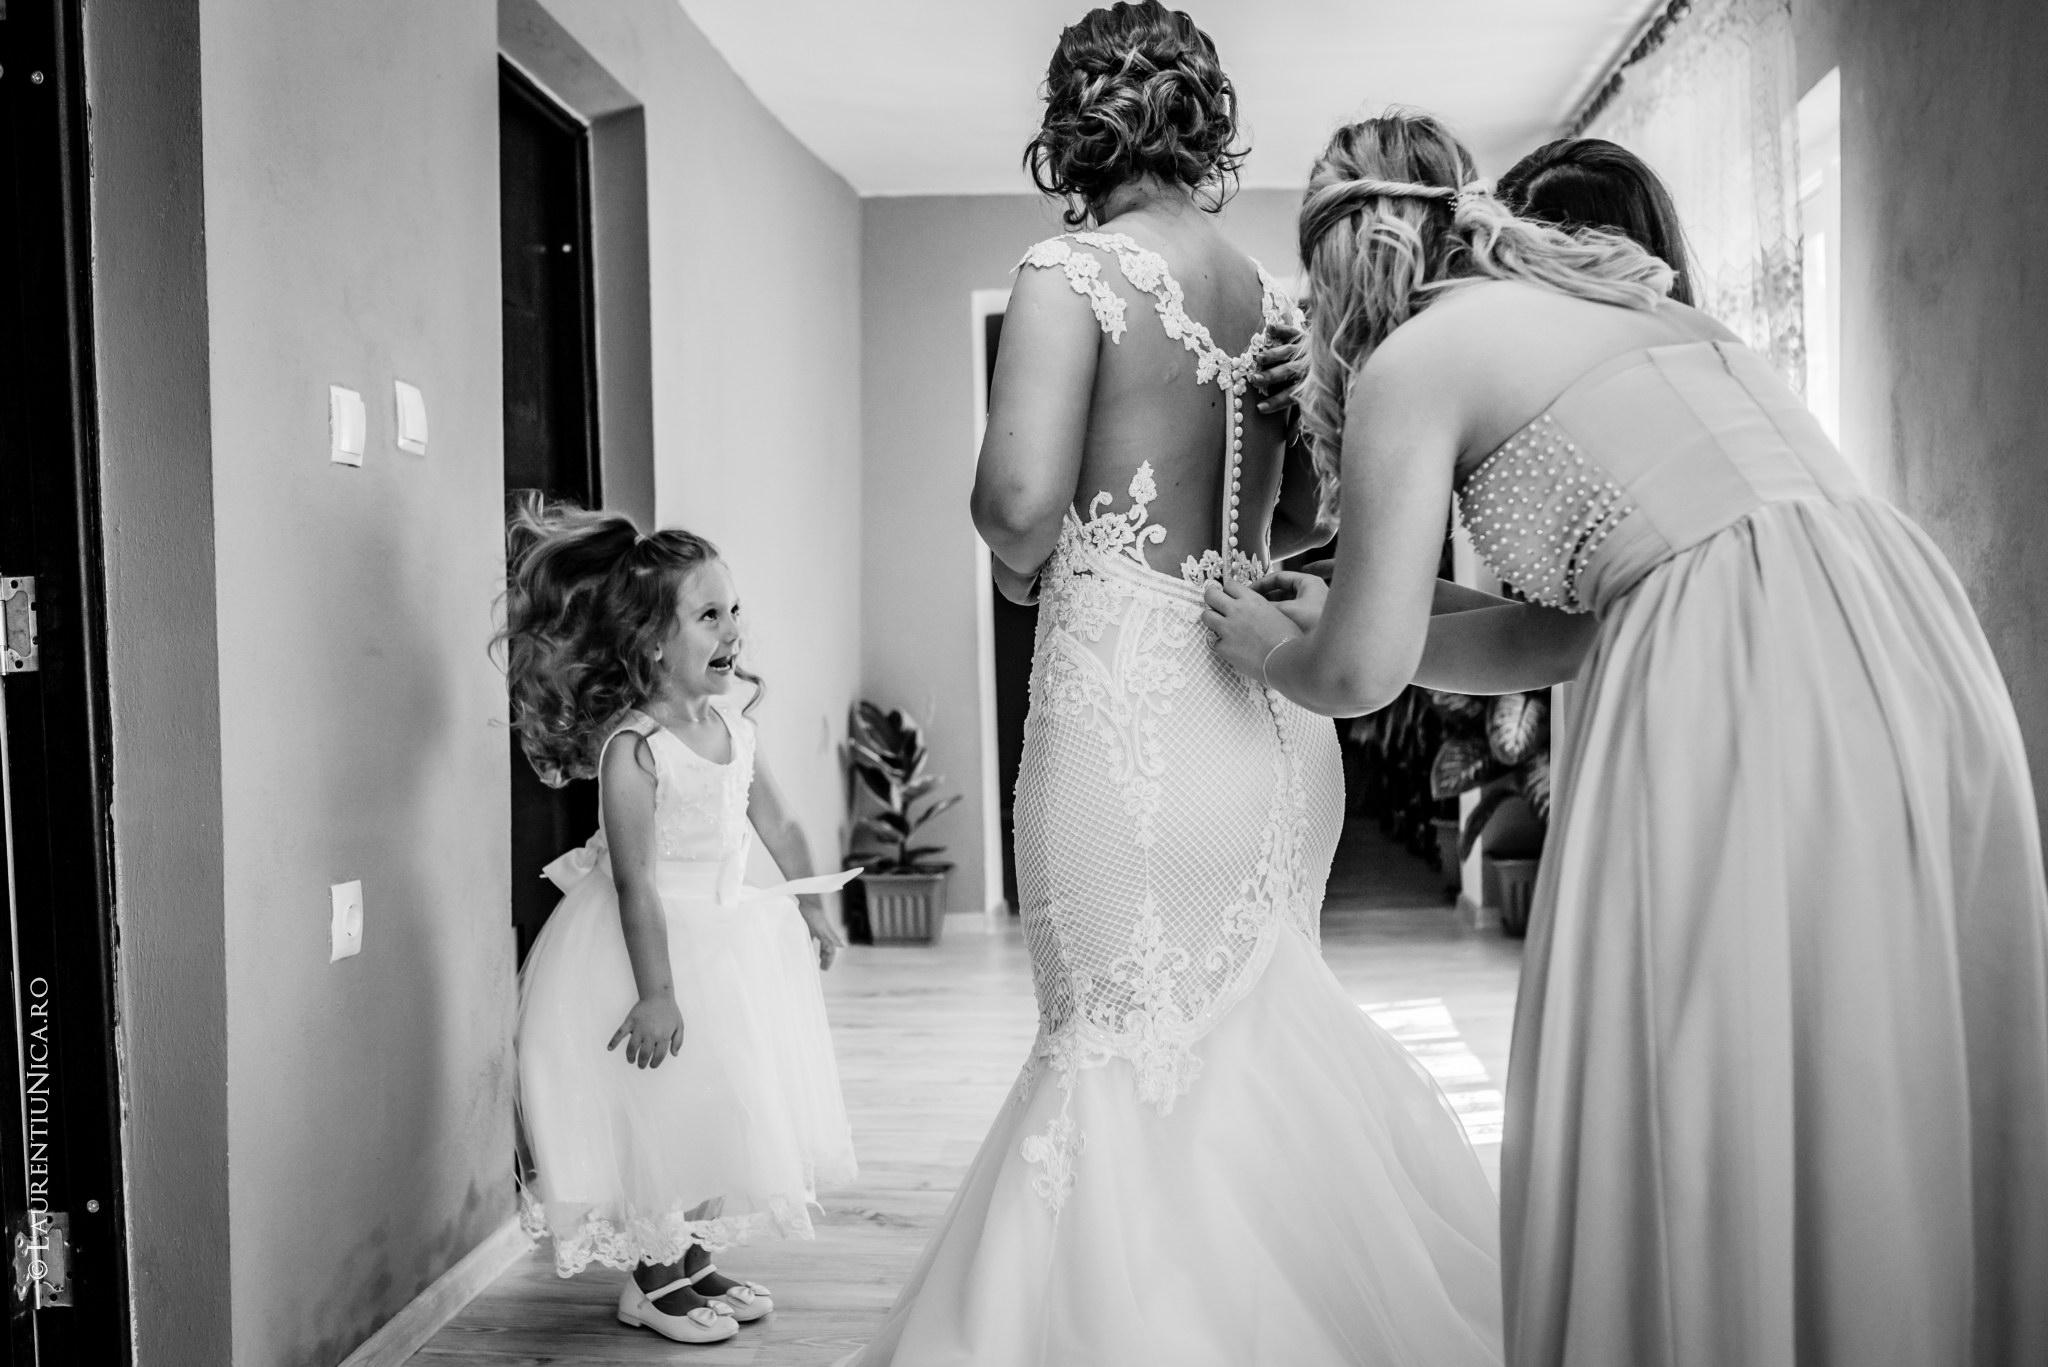 fotografii nunta Roxana si Cosmin fotograf nunta laurentiu nica 16 - Roxana & Cosmin | Fotografii nunta | Ticleni, judetul Gorj